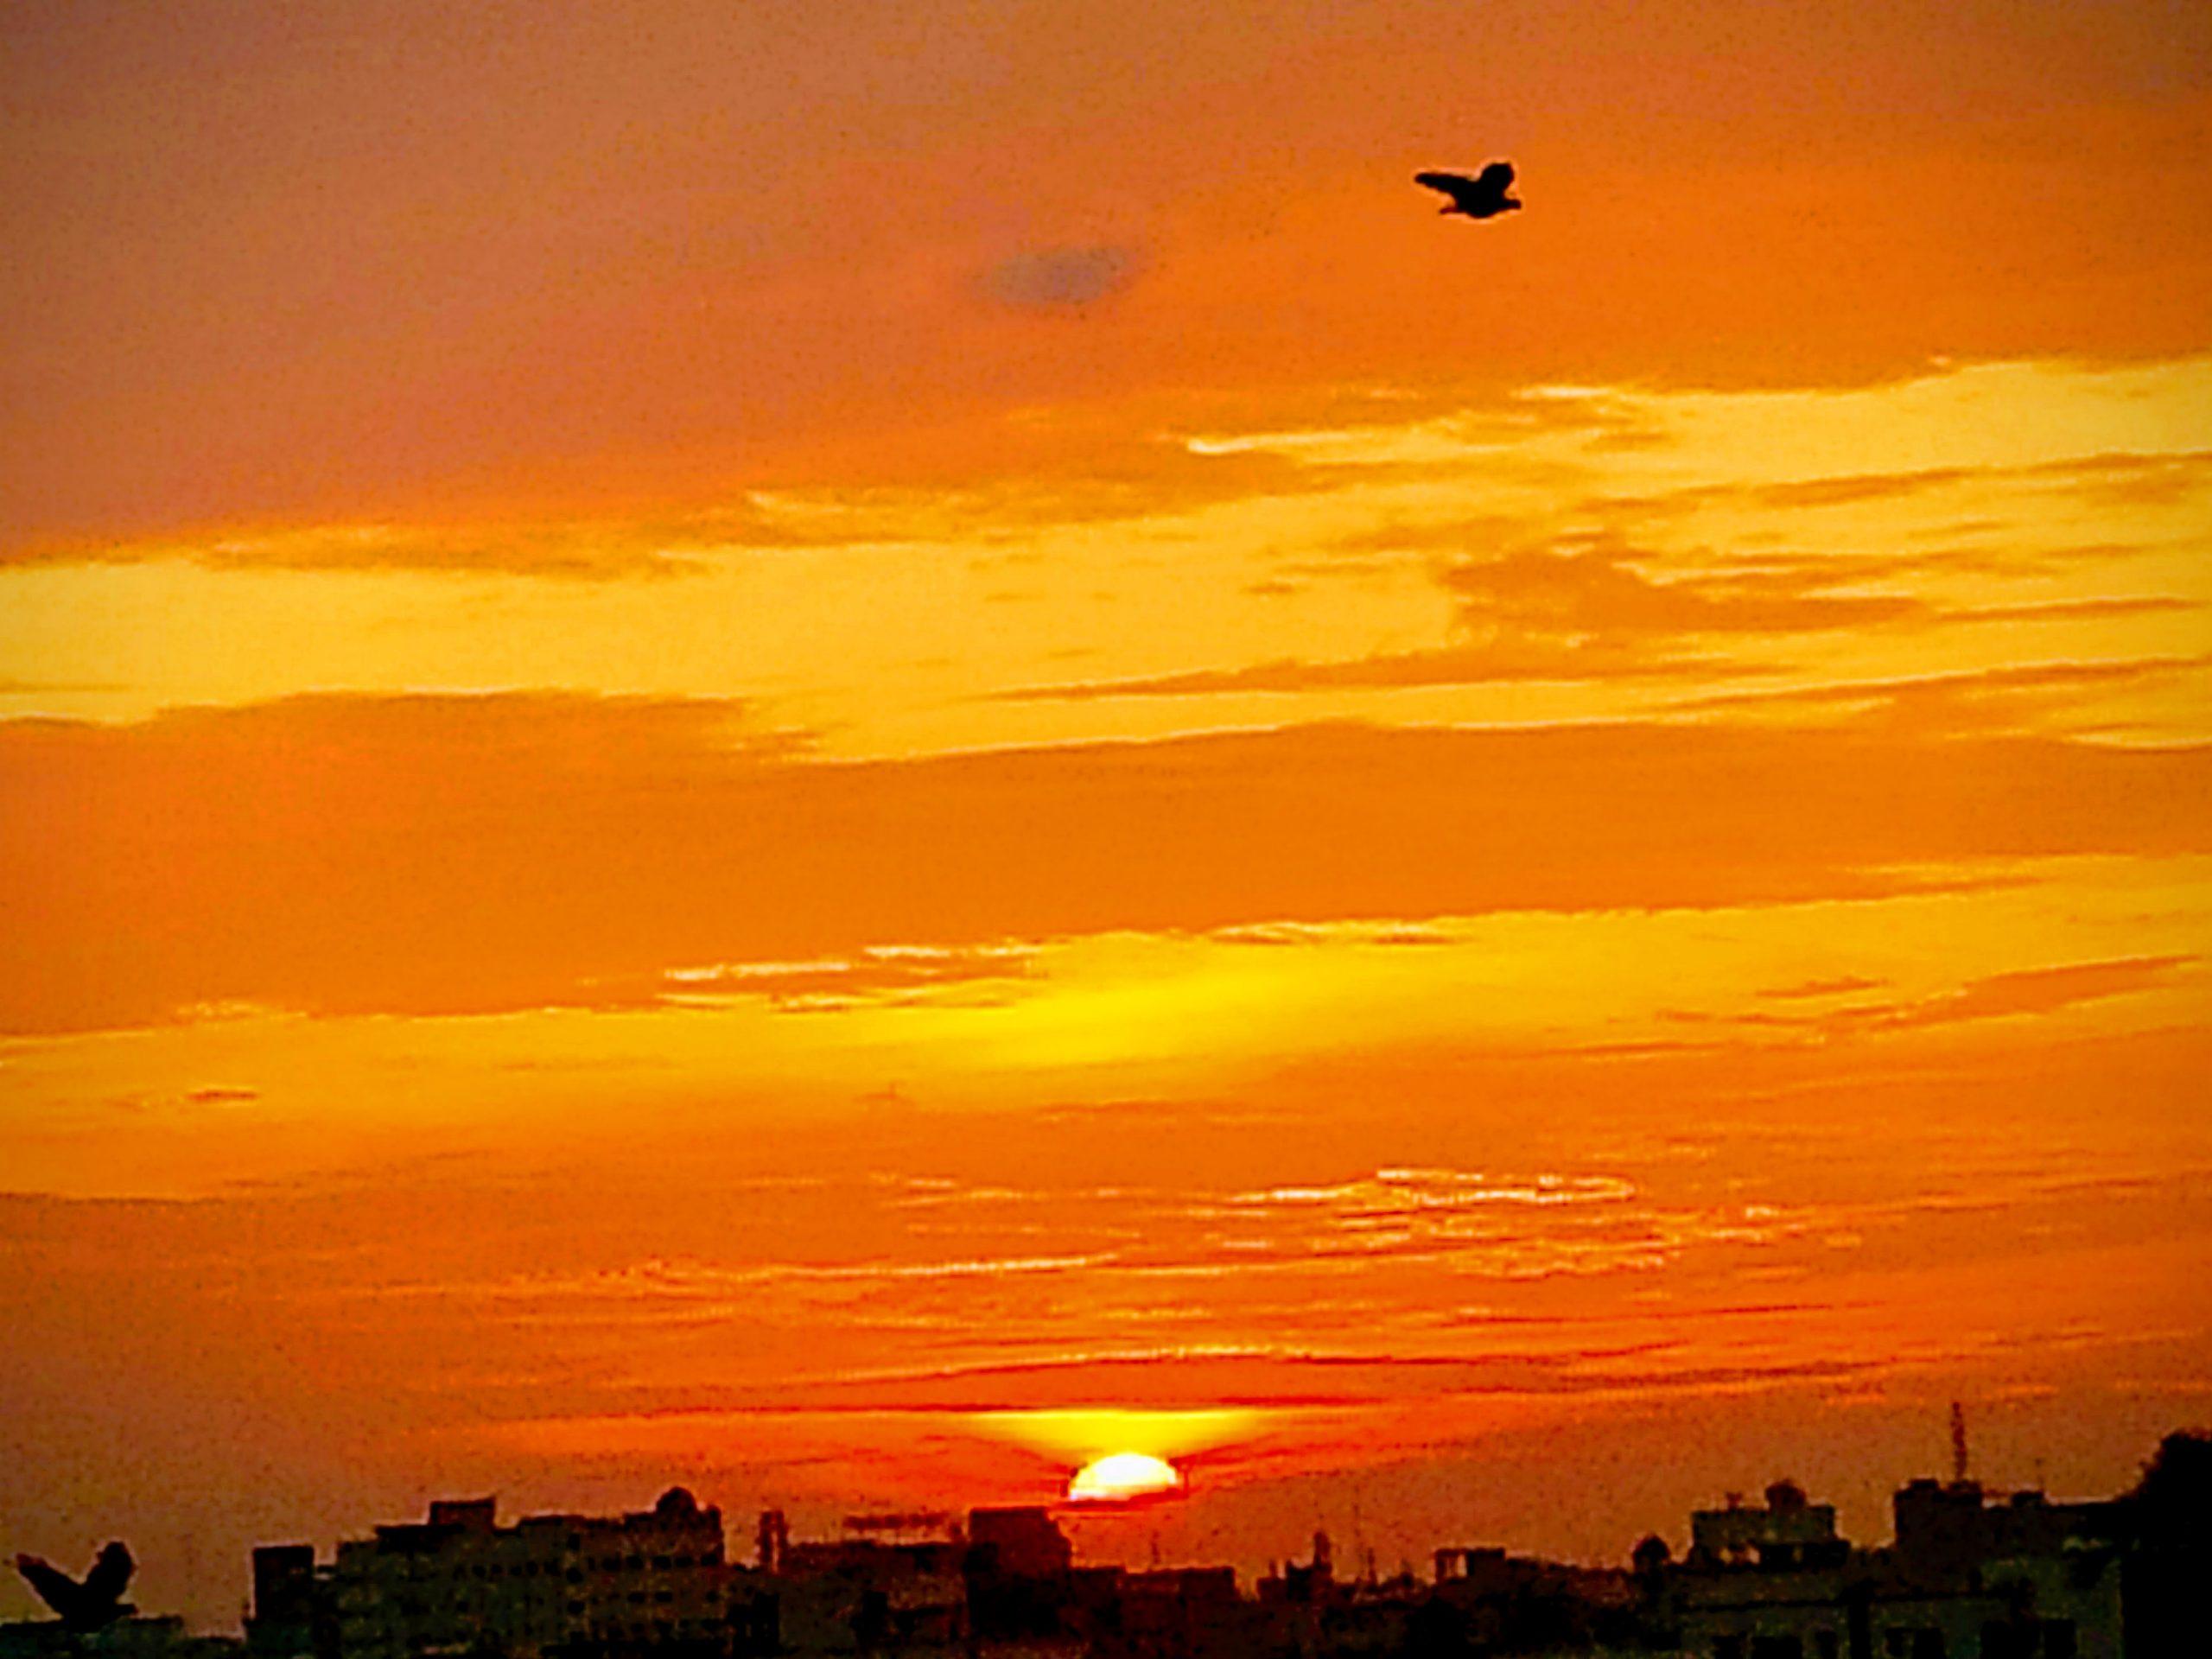 Sunset and the reddish sky